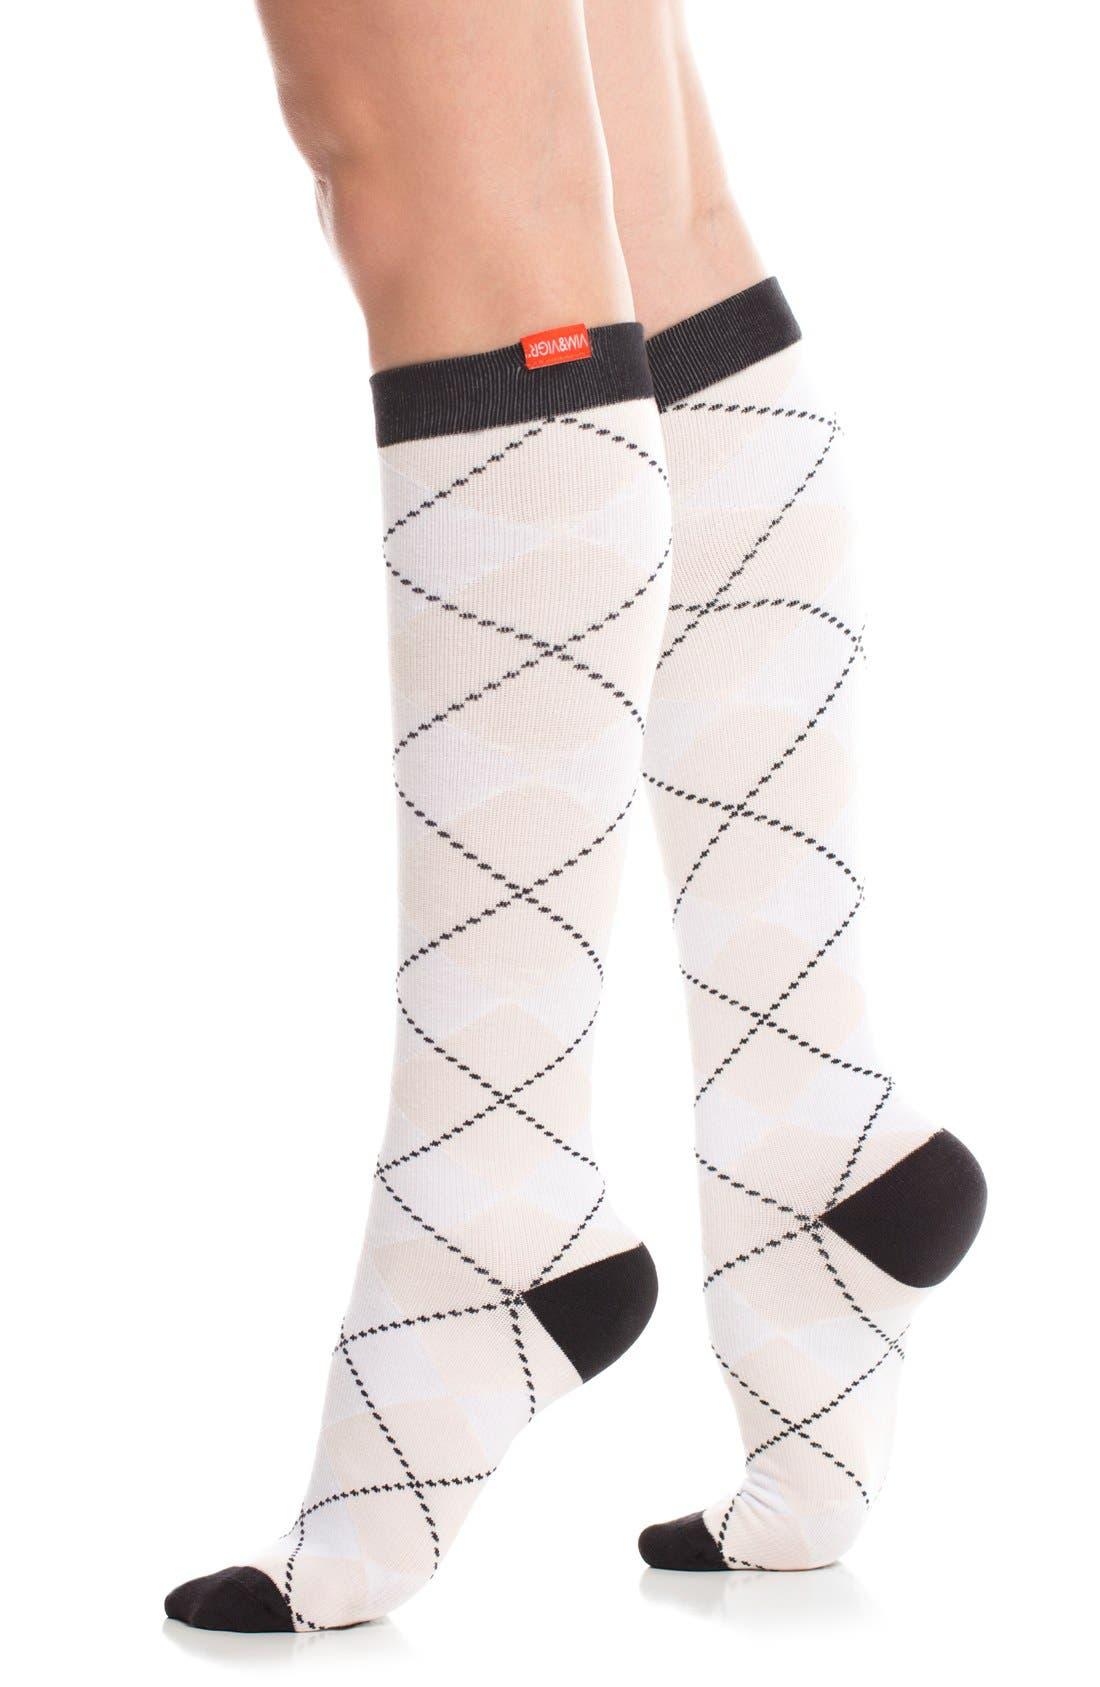 Argyle Graduated Compression Trouser Socks,                         Main,                         color, White/ Blush